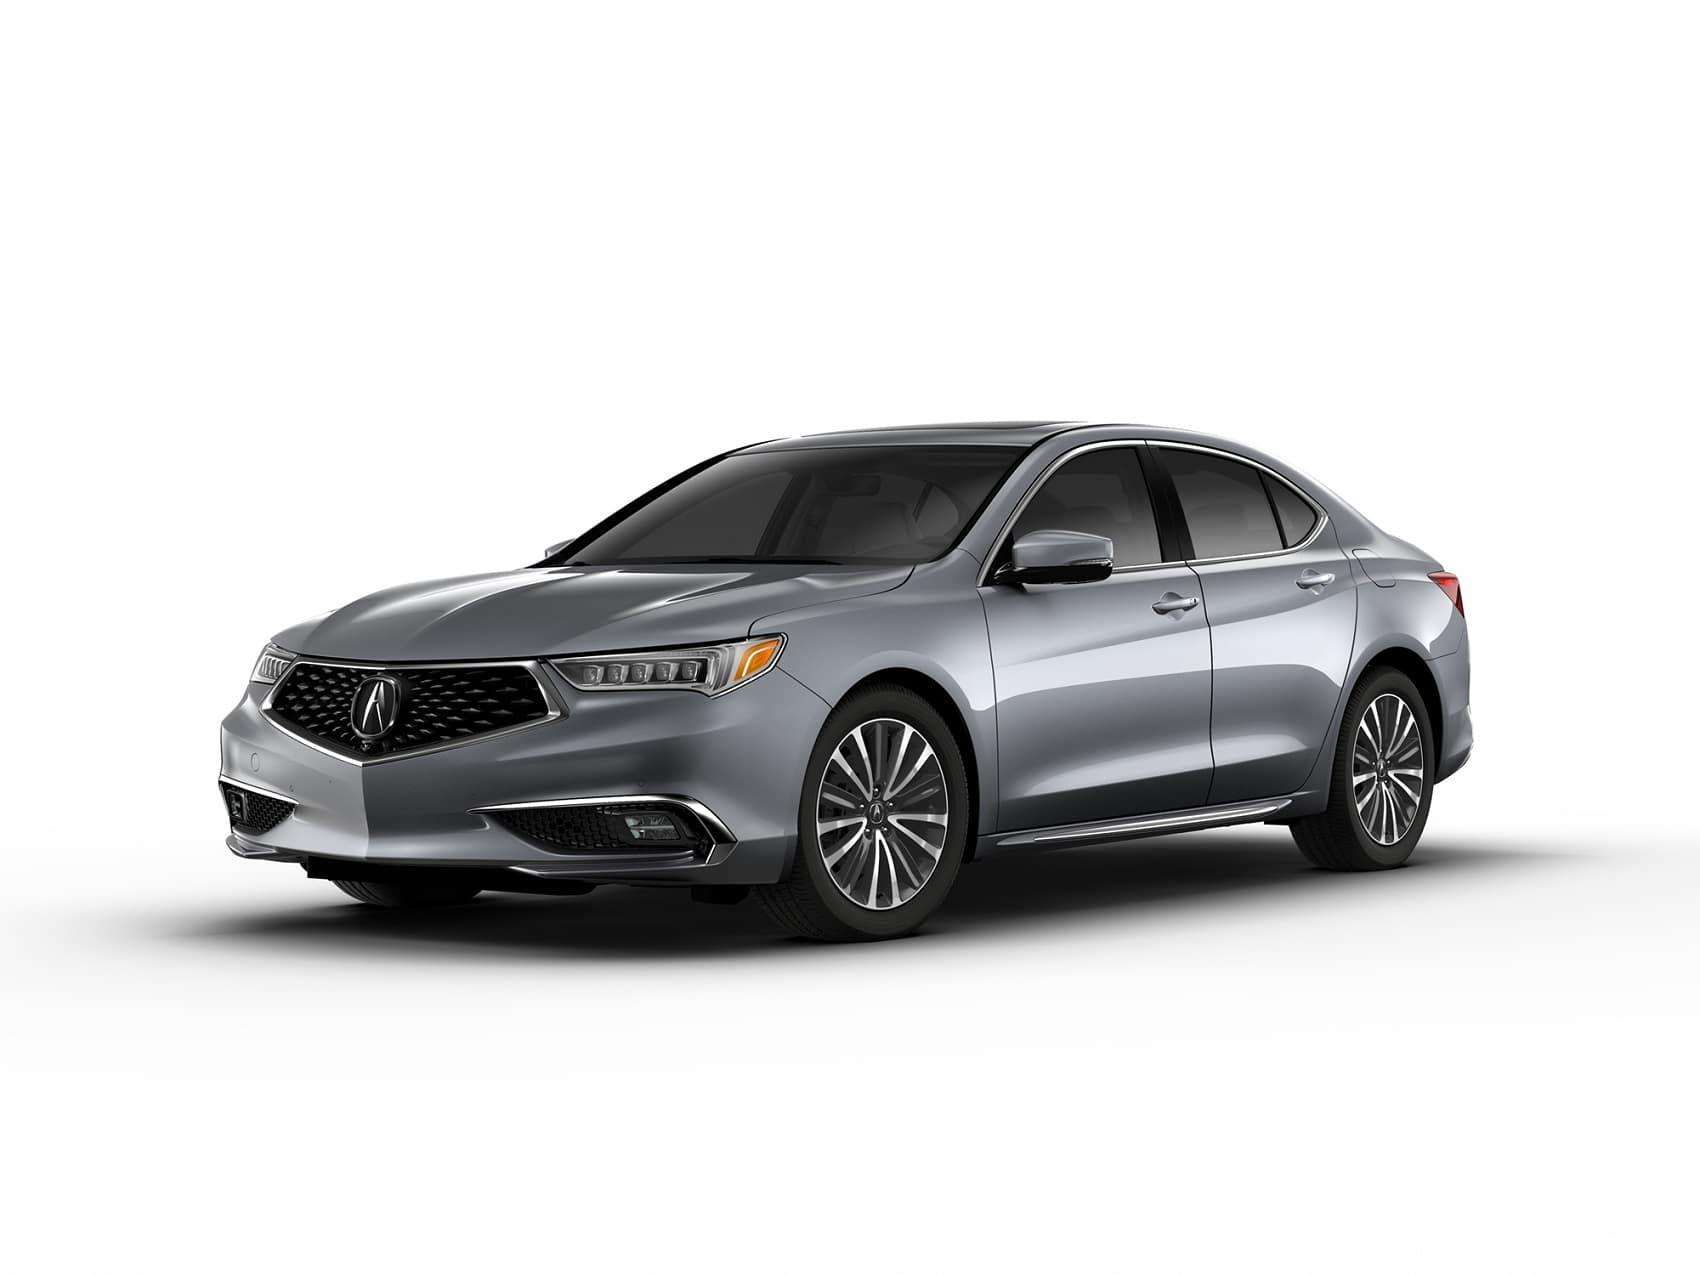 2020 Acura TLX Silver